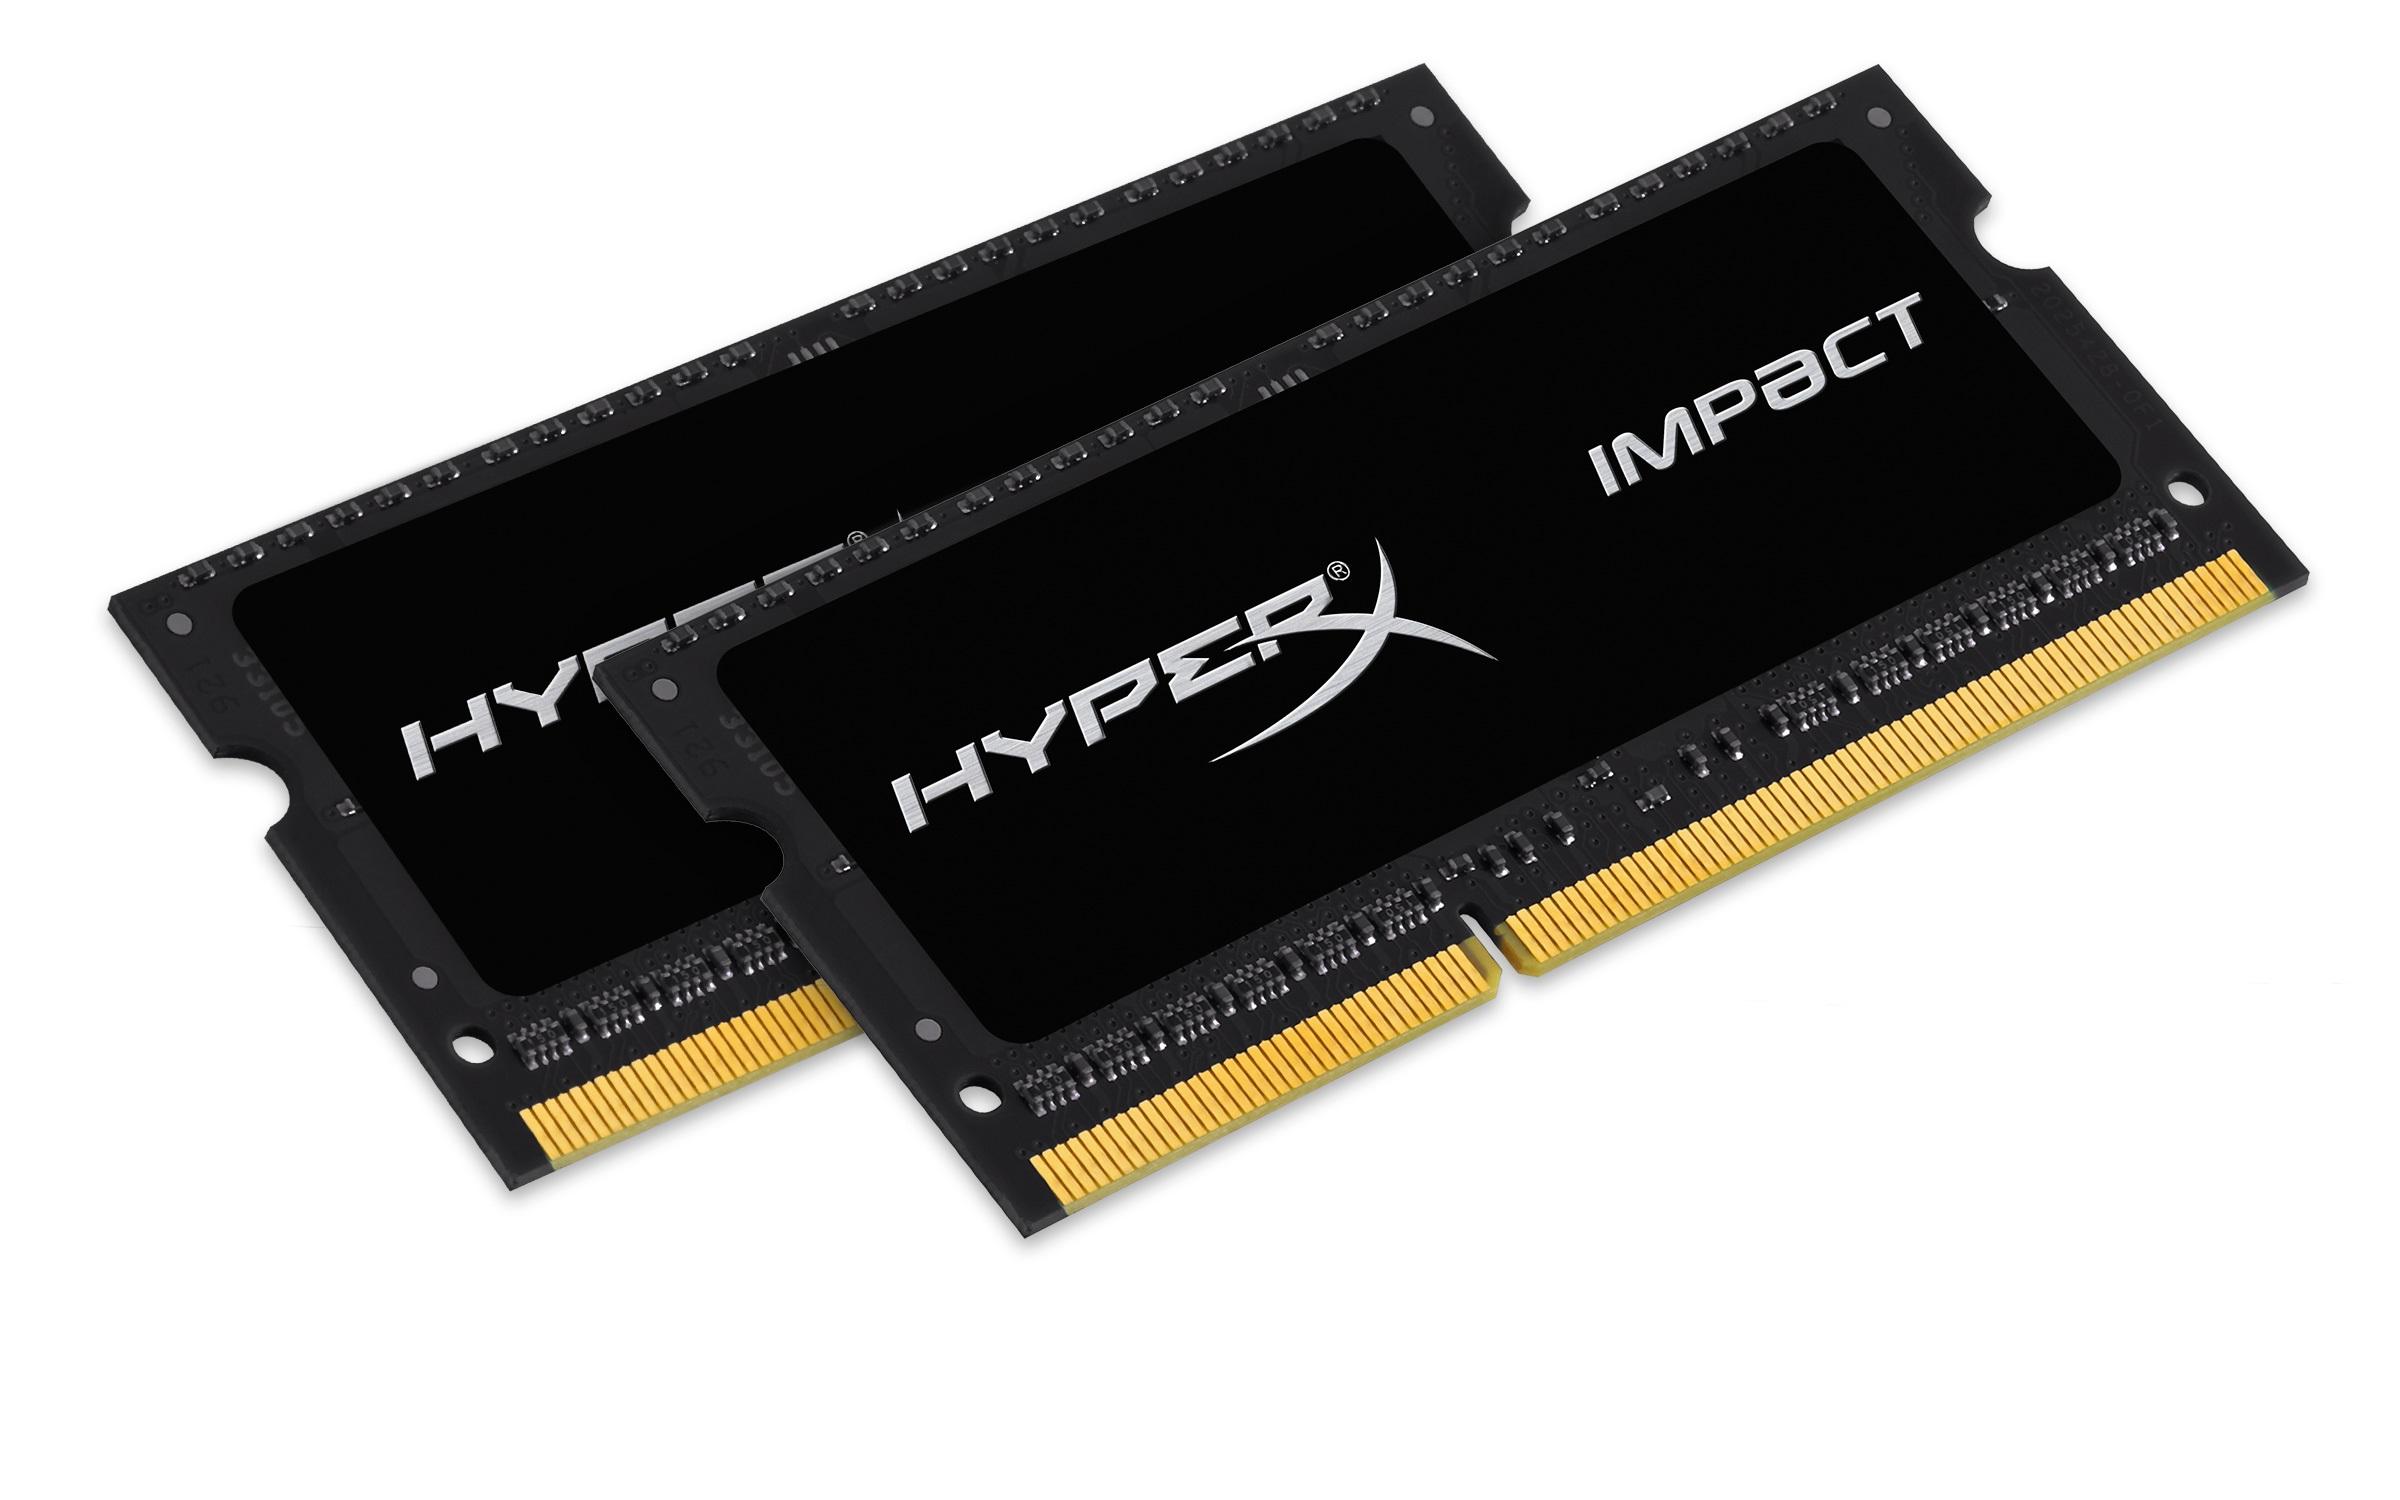 HyperX Impact 4GB 1866MHz DDR3L CL11 SODIMM 1.35V, černý chladič